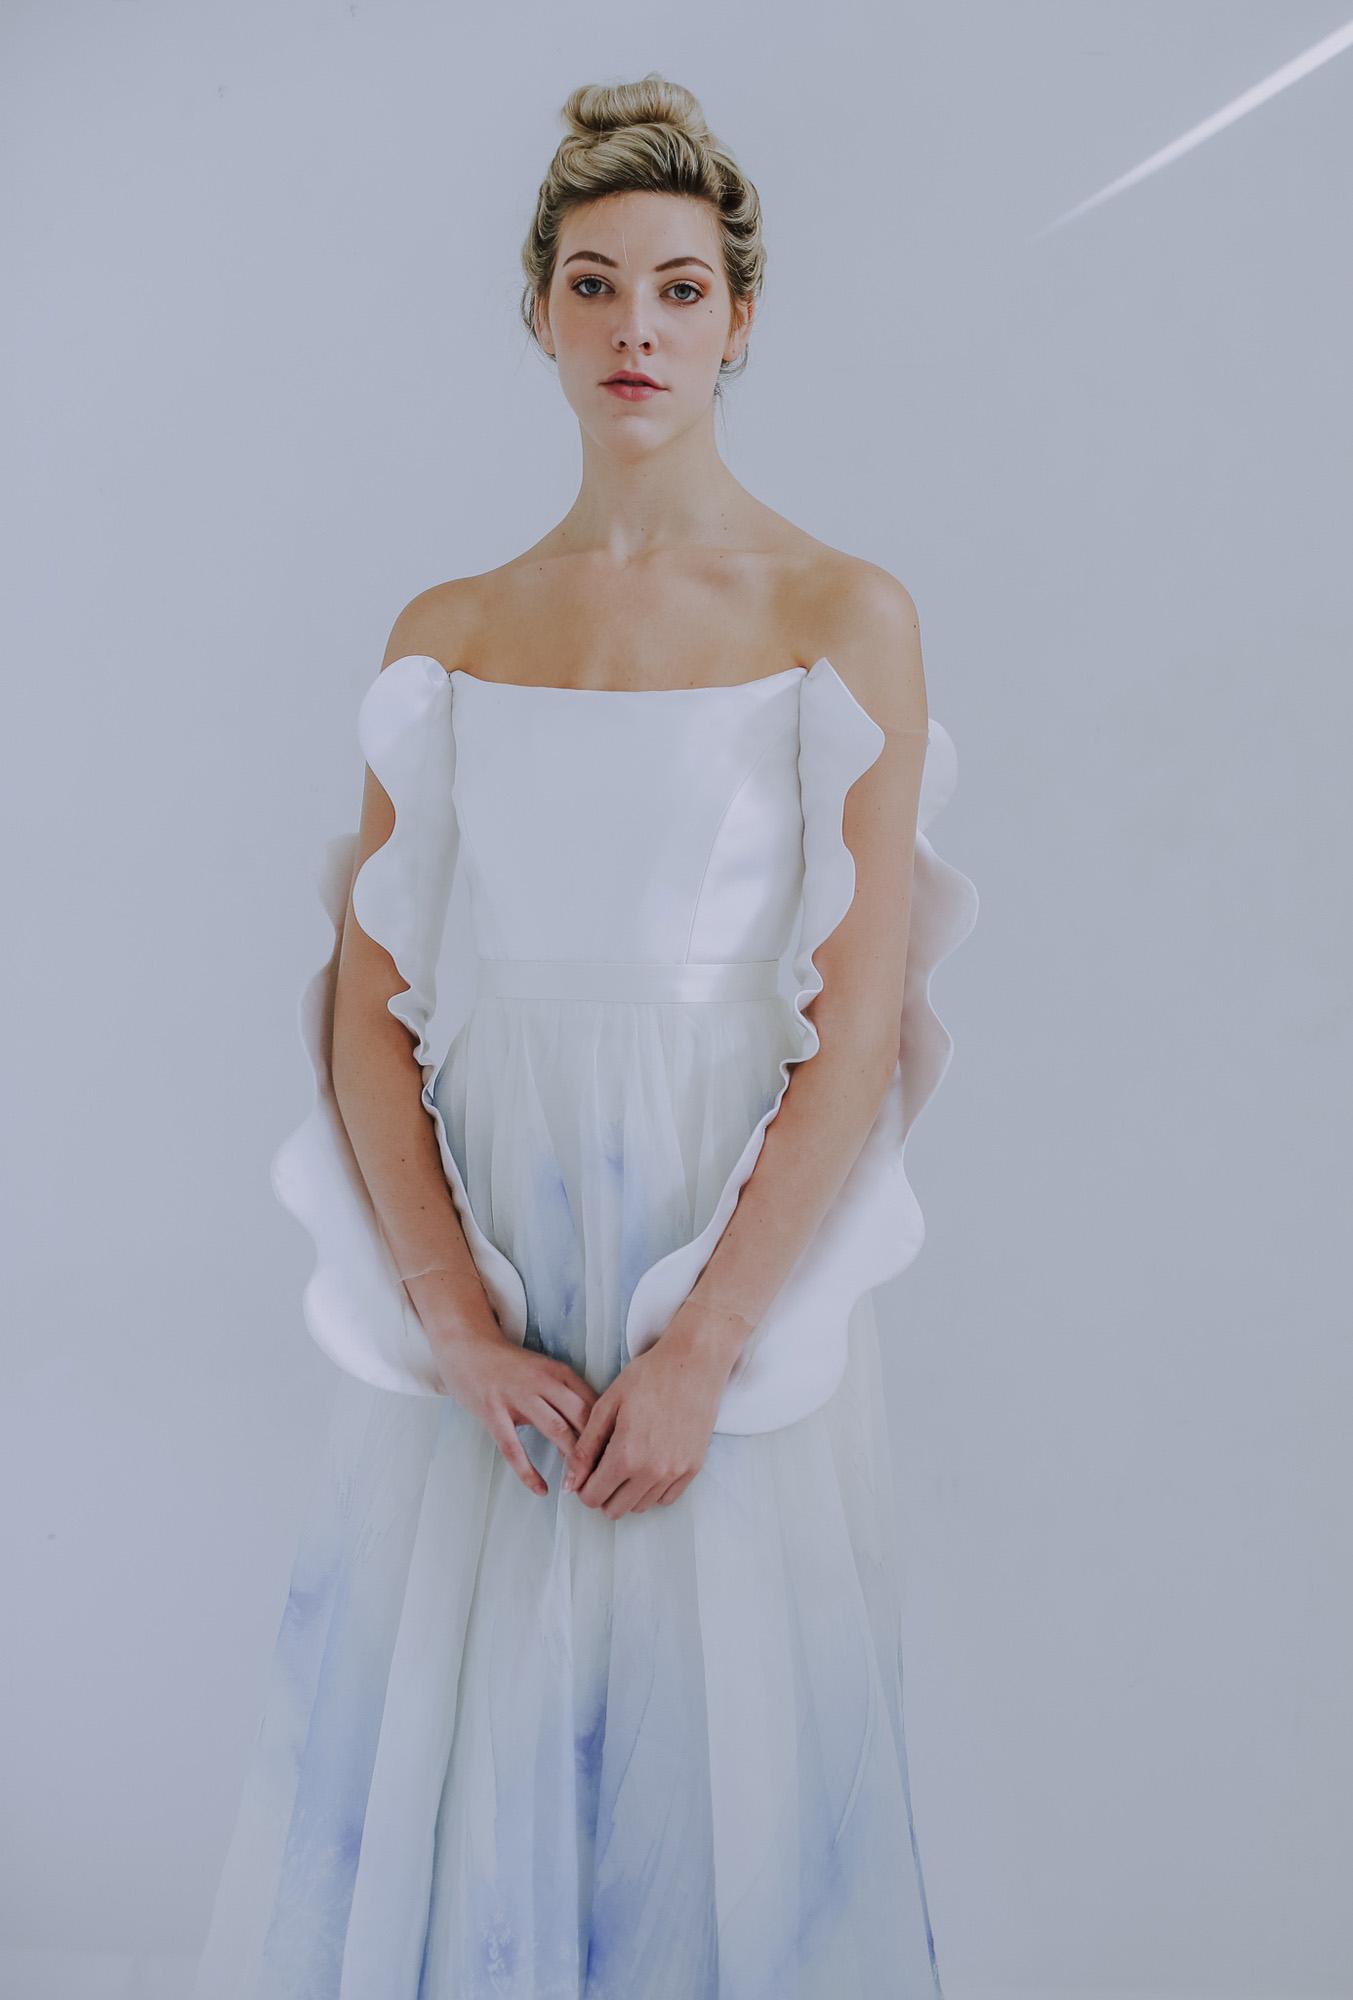 leanne-marshall-wedding-gown-12.jpg